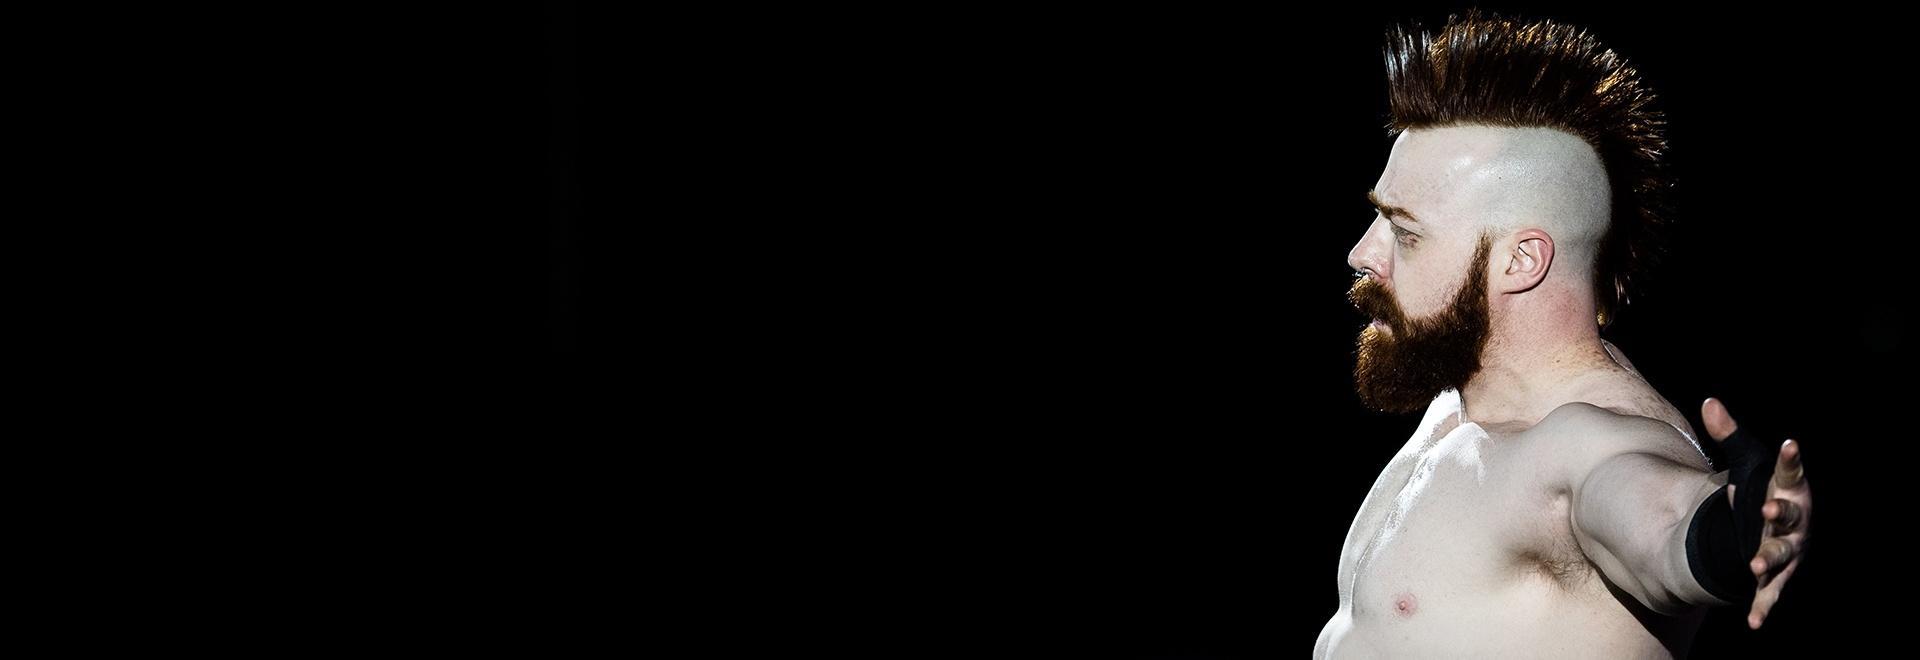 Ep. 24